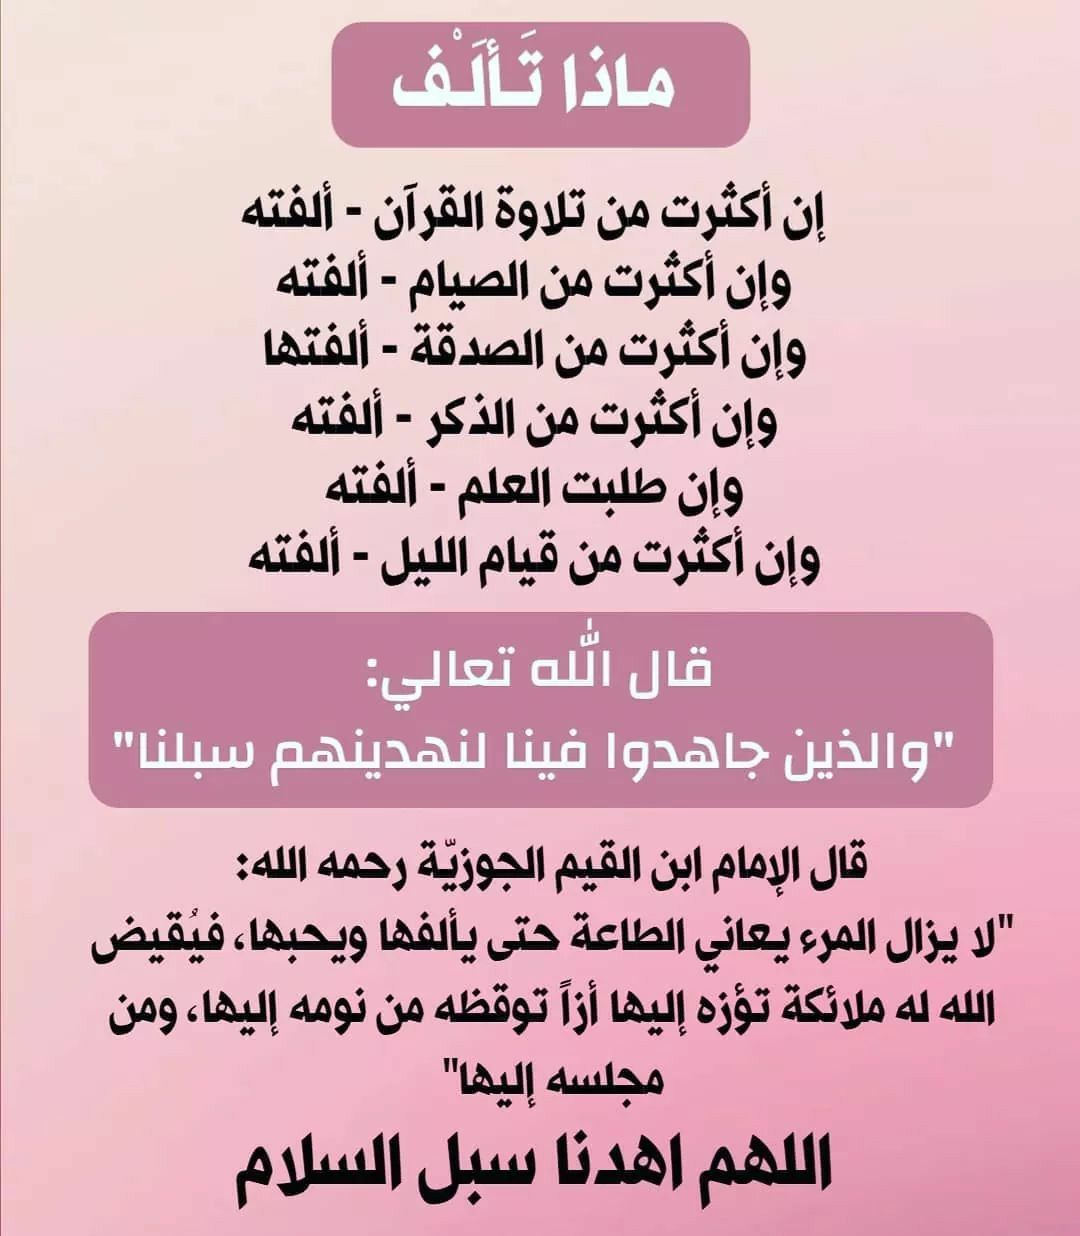 Pin By The Noble Quran On I Love Allah Quran Islam The Prophet Miracles Hadith Heaven Prophets Faith Prayer Dua حكم وعبر احاديث الله اسلام قرآن دعاء Islamic Quotes Peace Be Upon